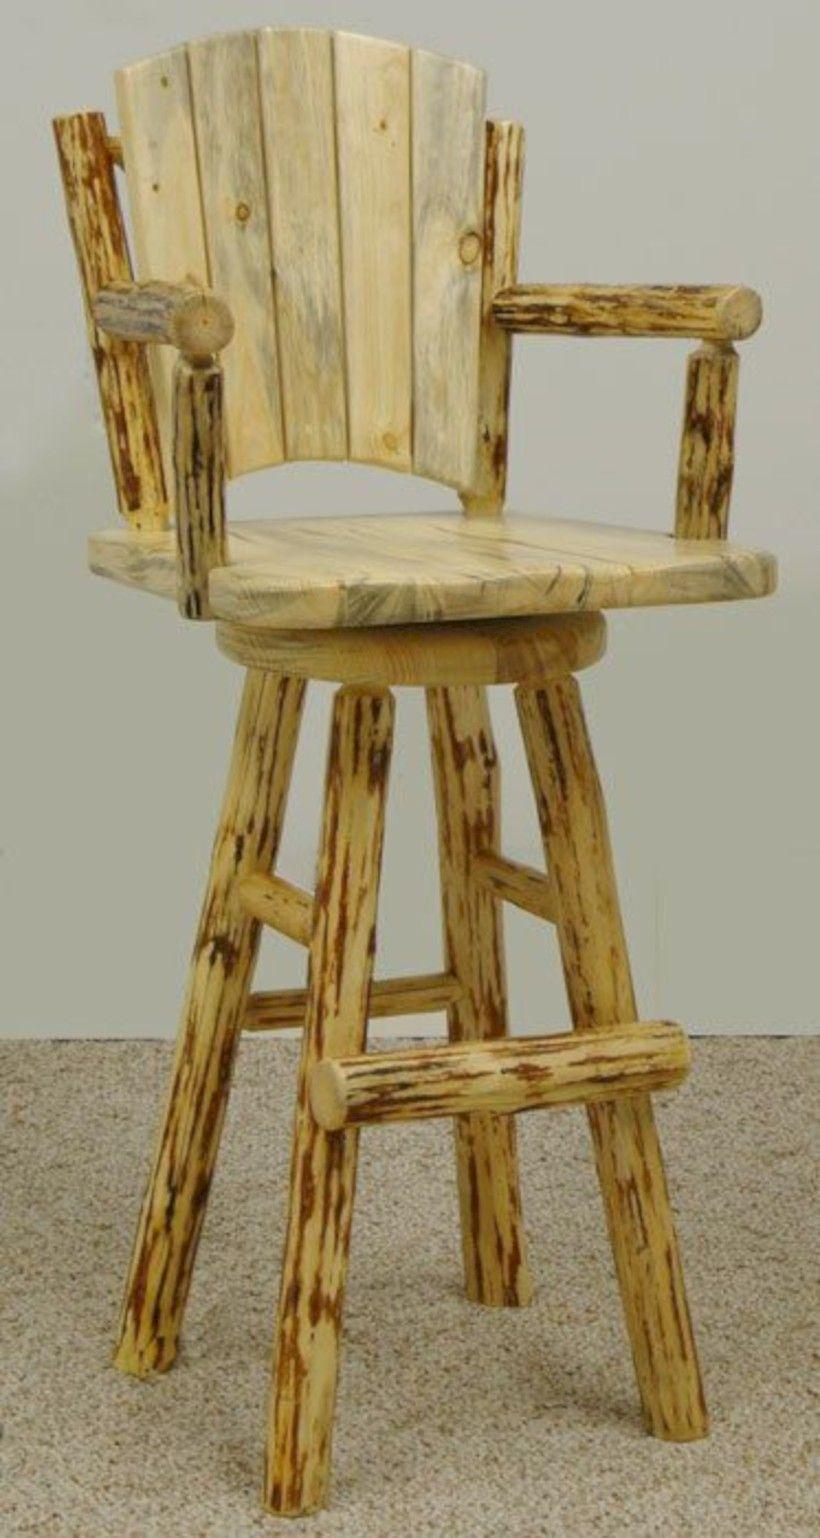 Inspiring rustic log bar stools ideas